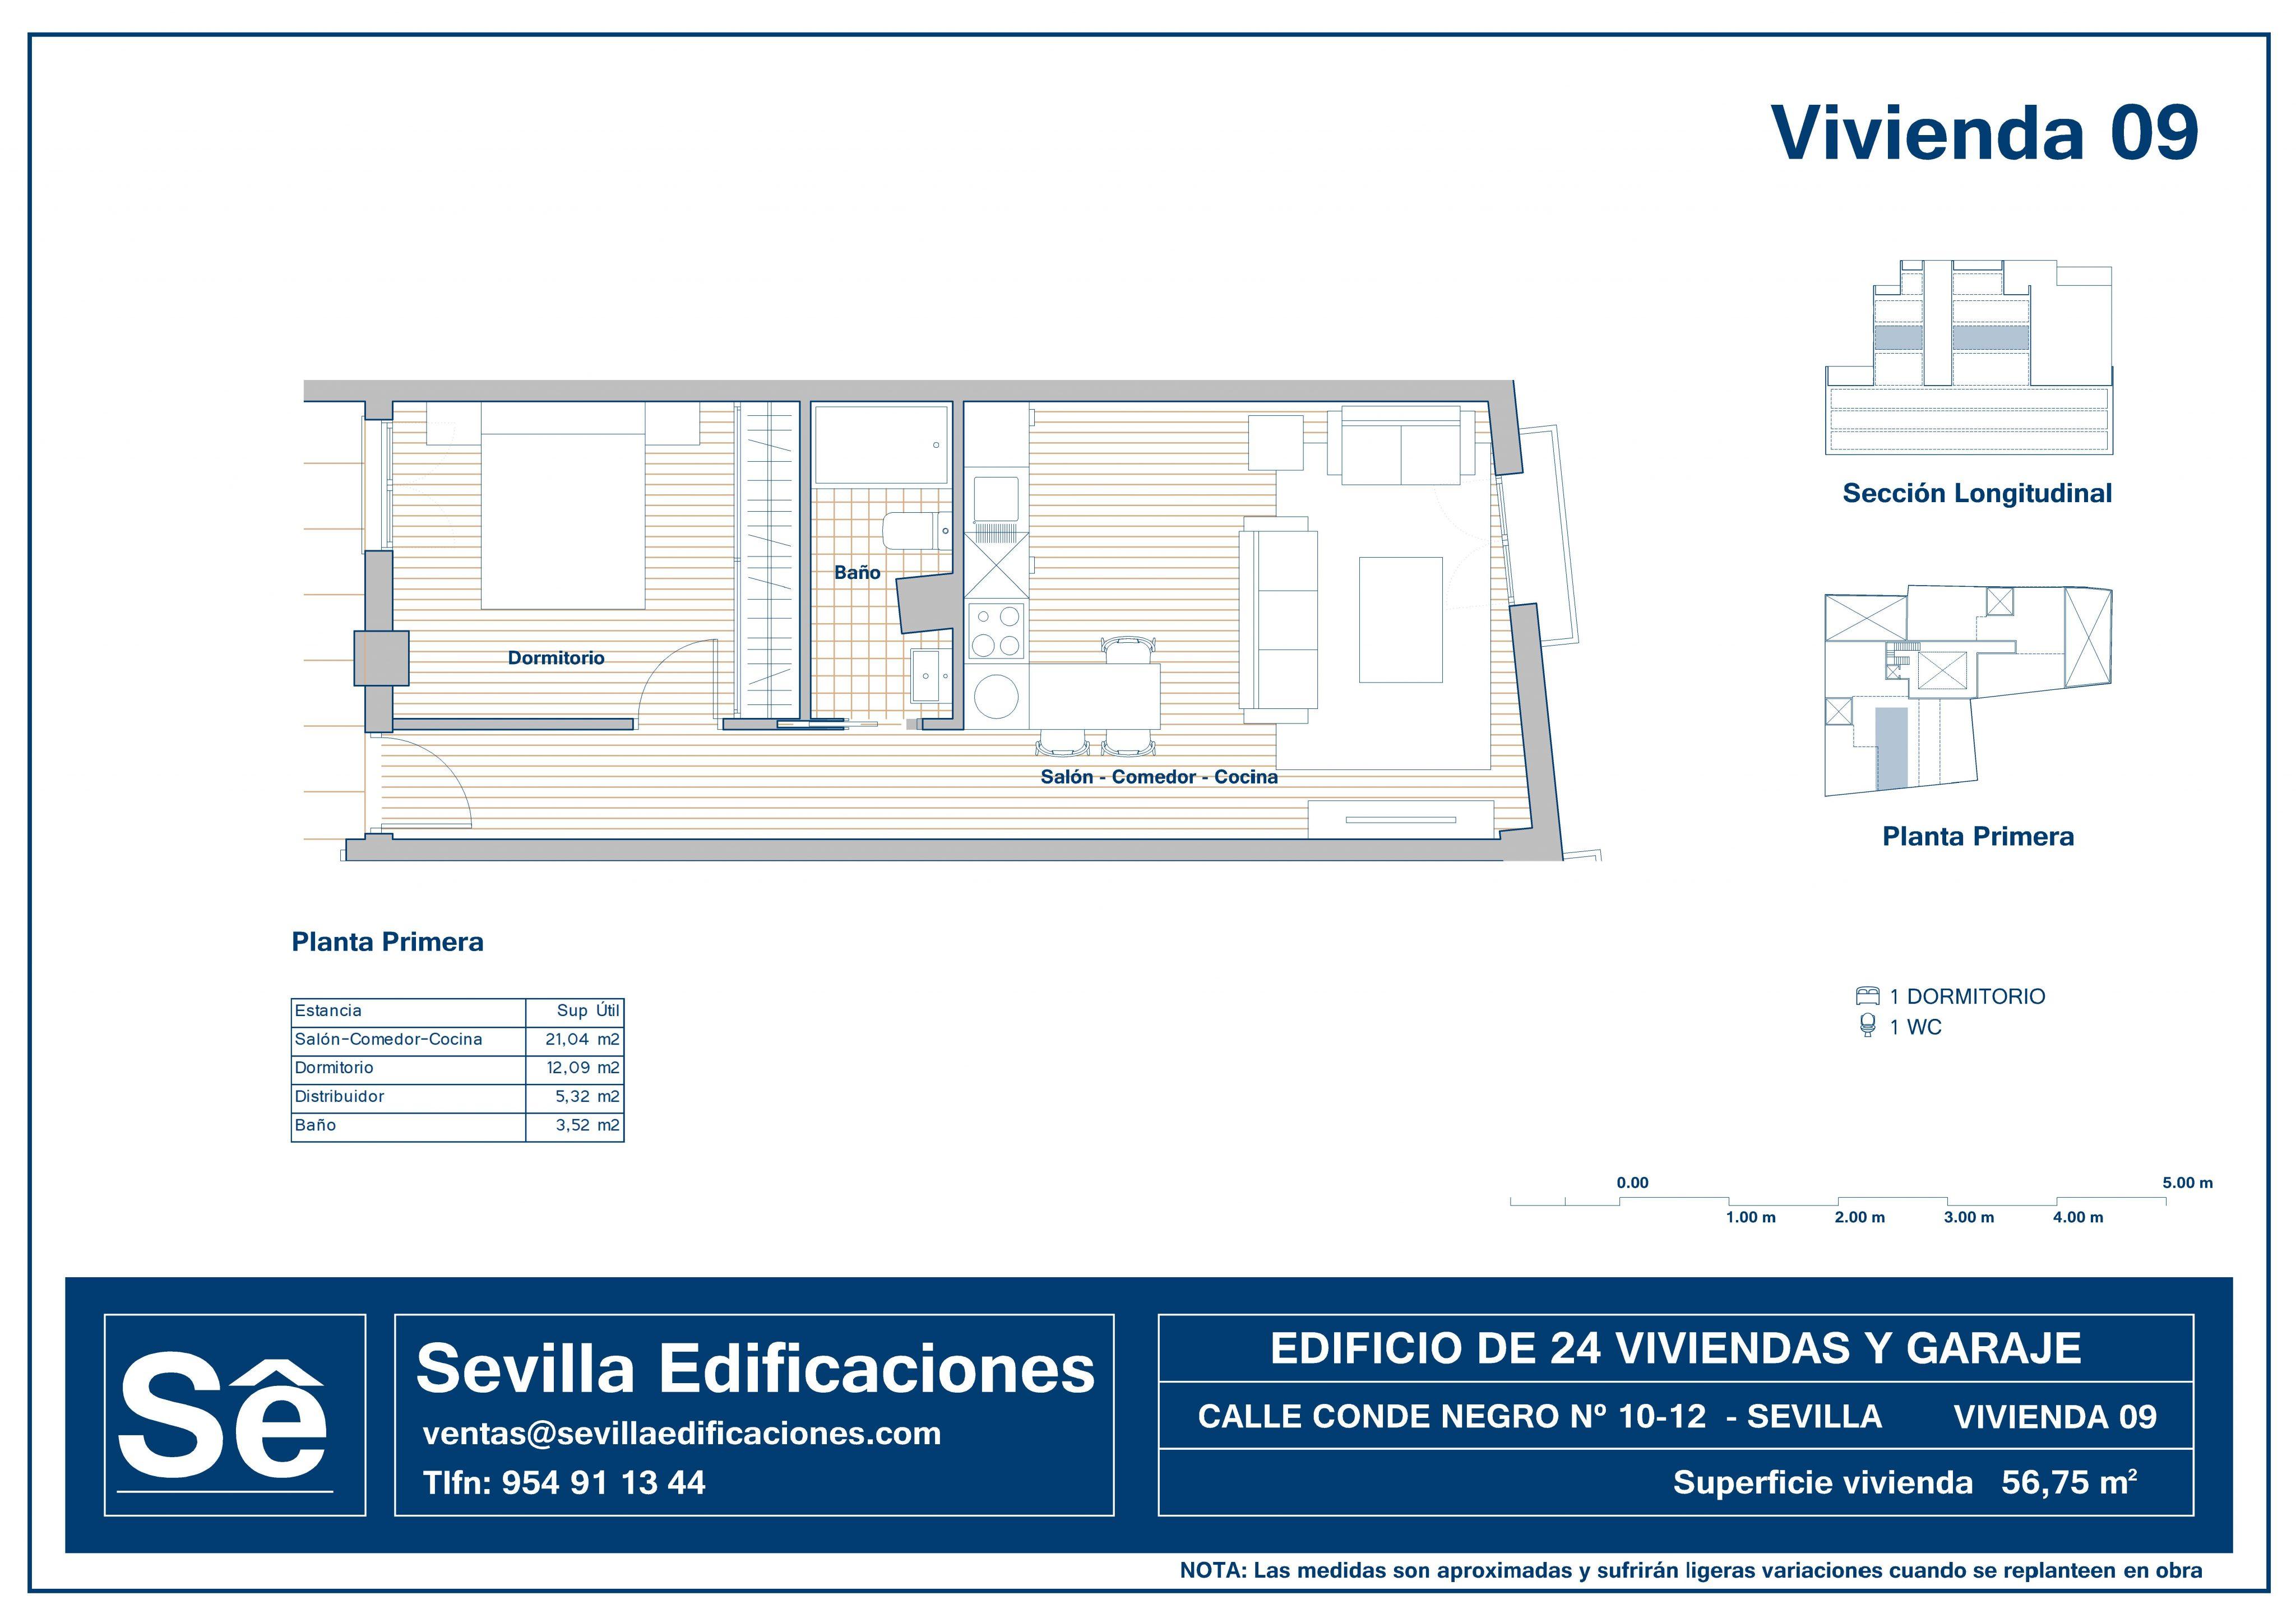 CONDENEGRO_VIVIENDA_09